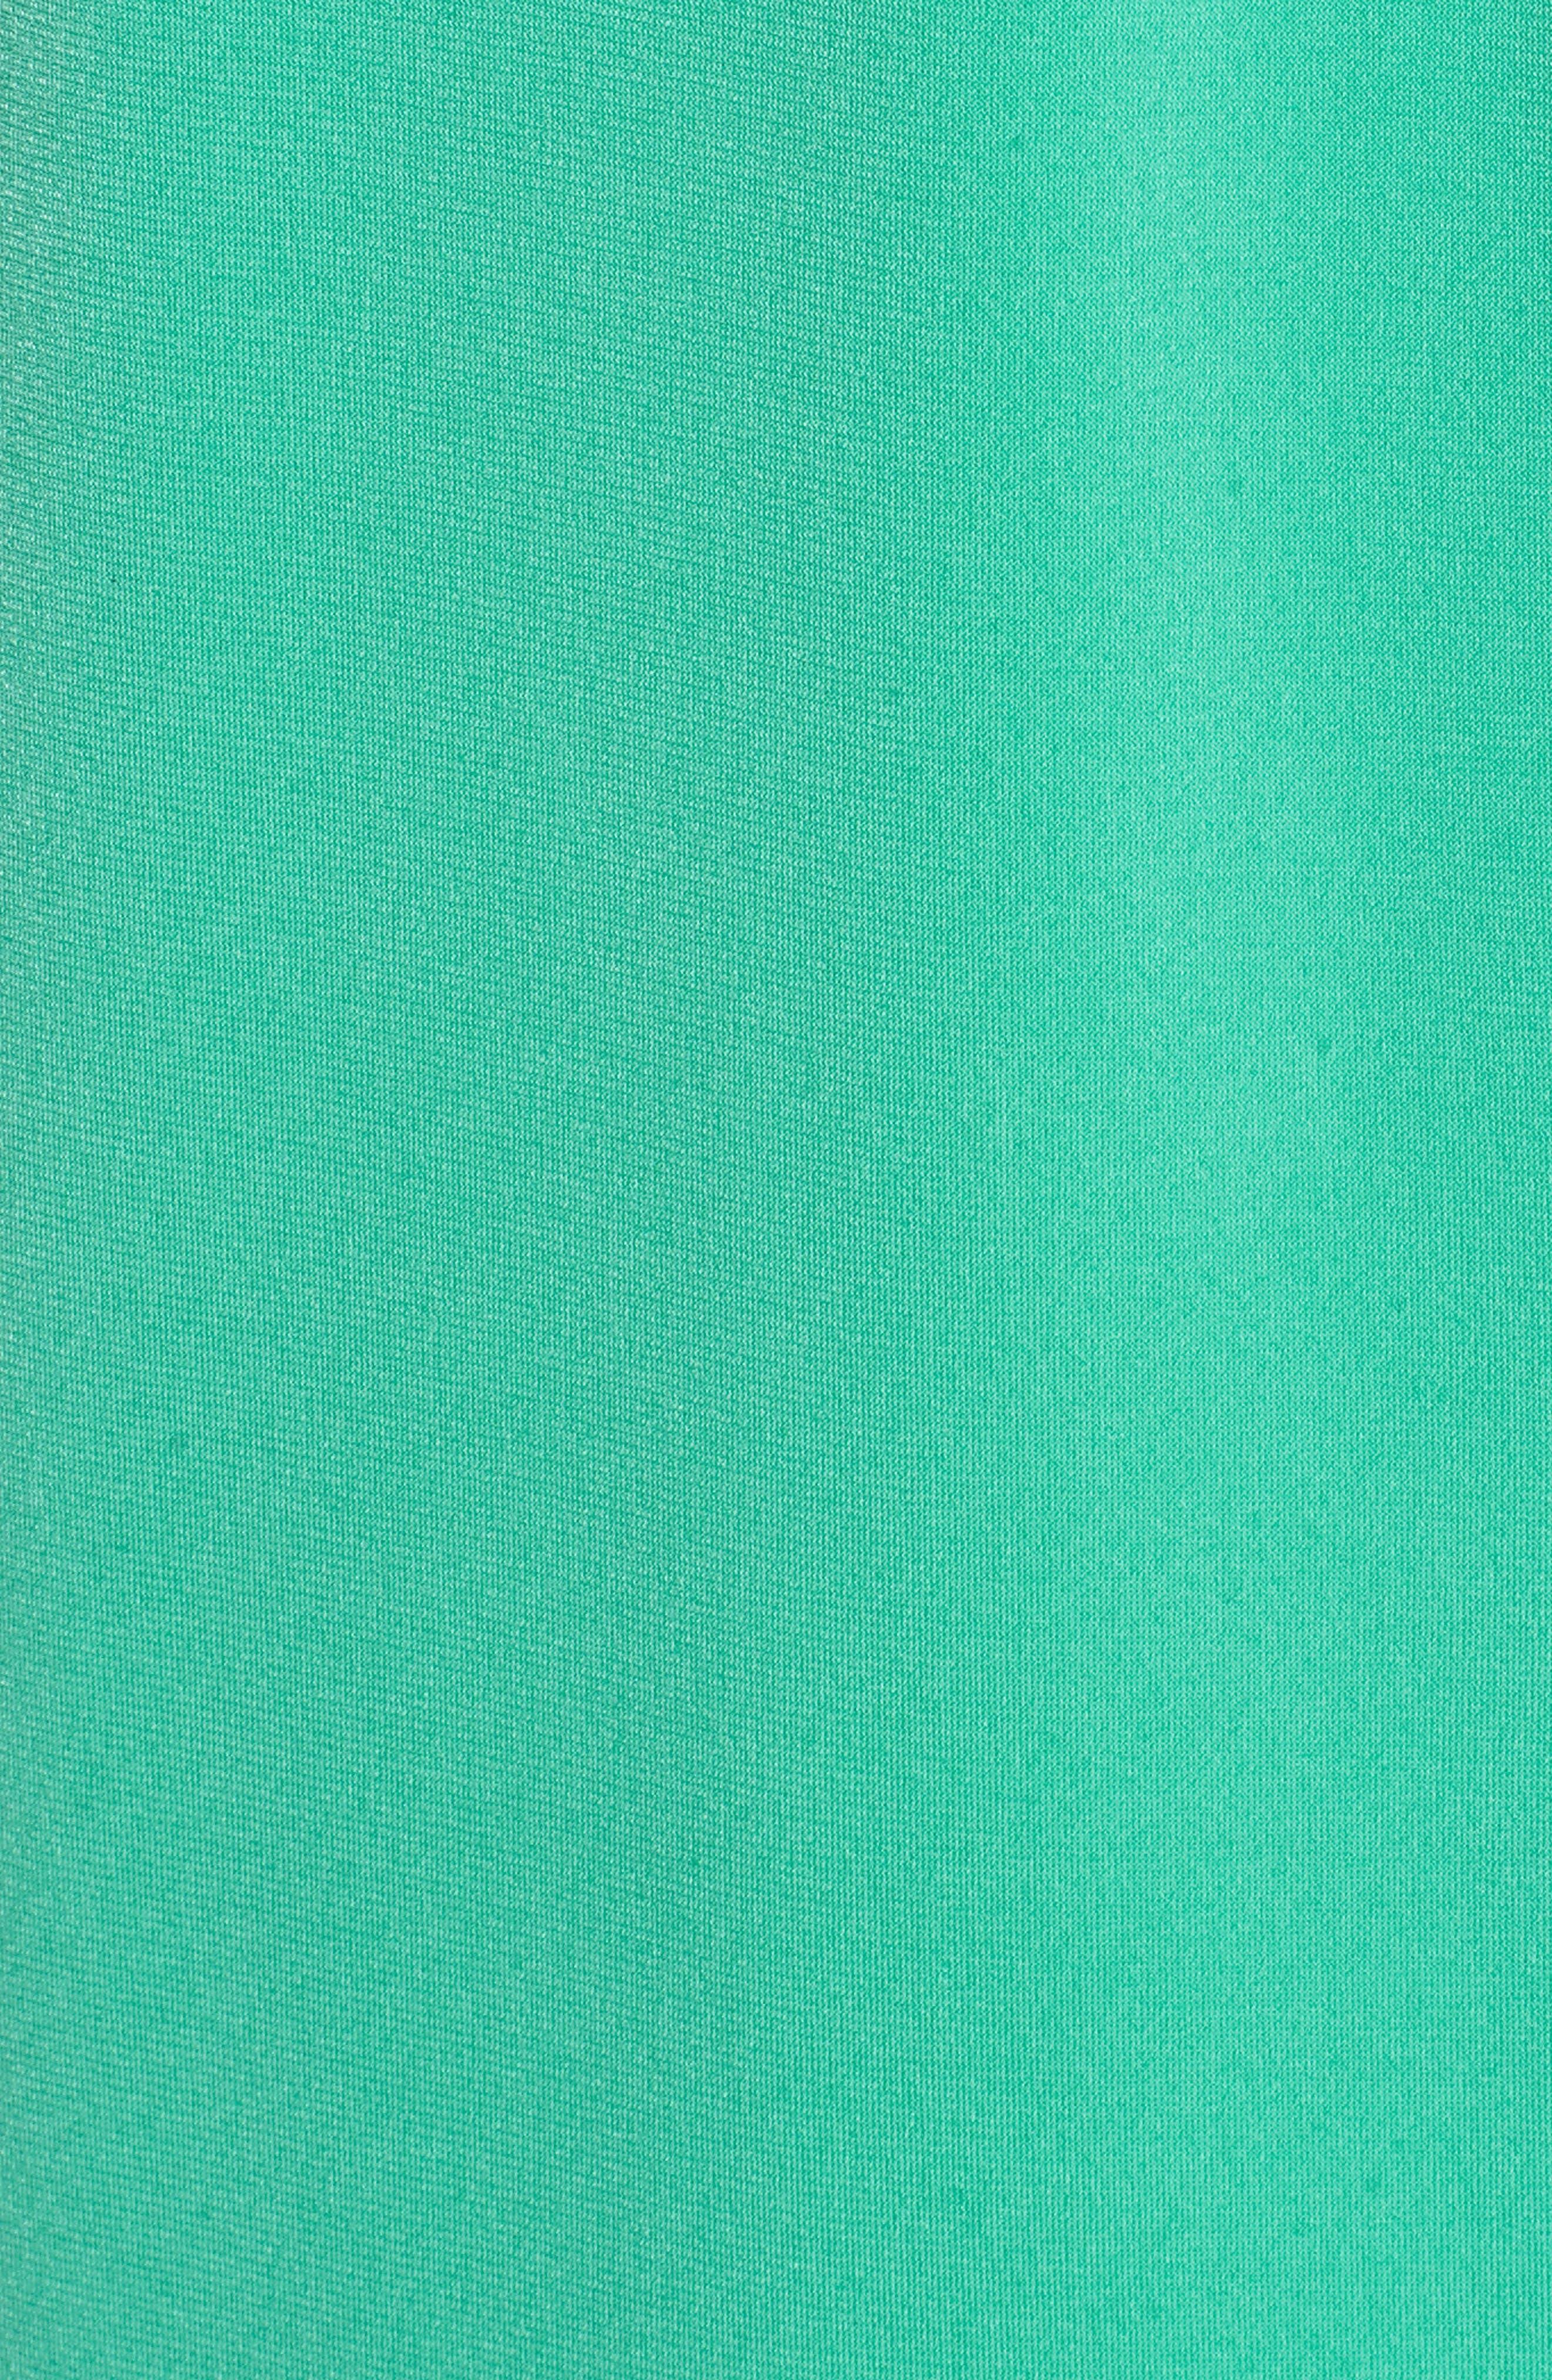 Chain Detail Halter Dress,                             Alternate thumbnail 7, color,                             300